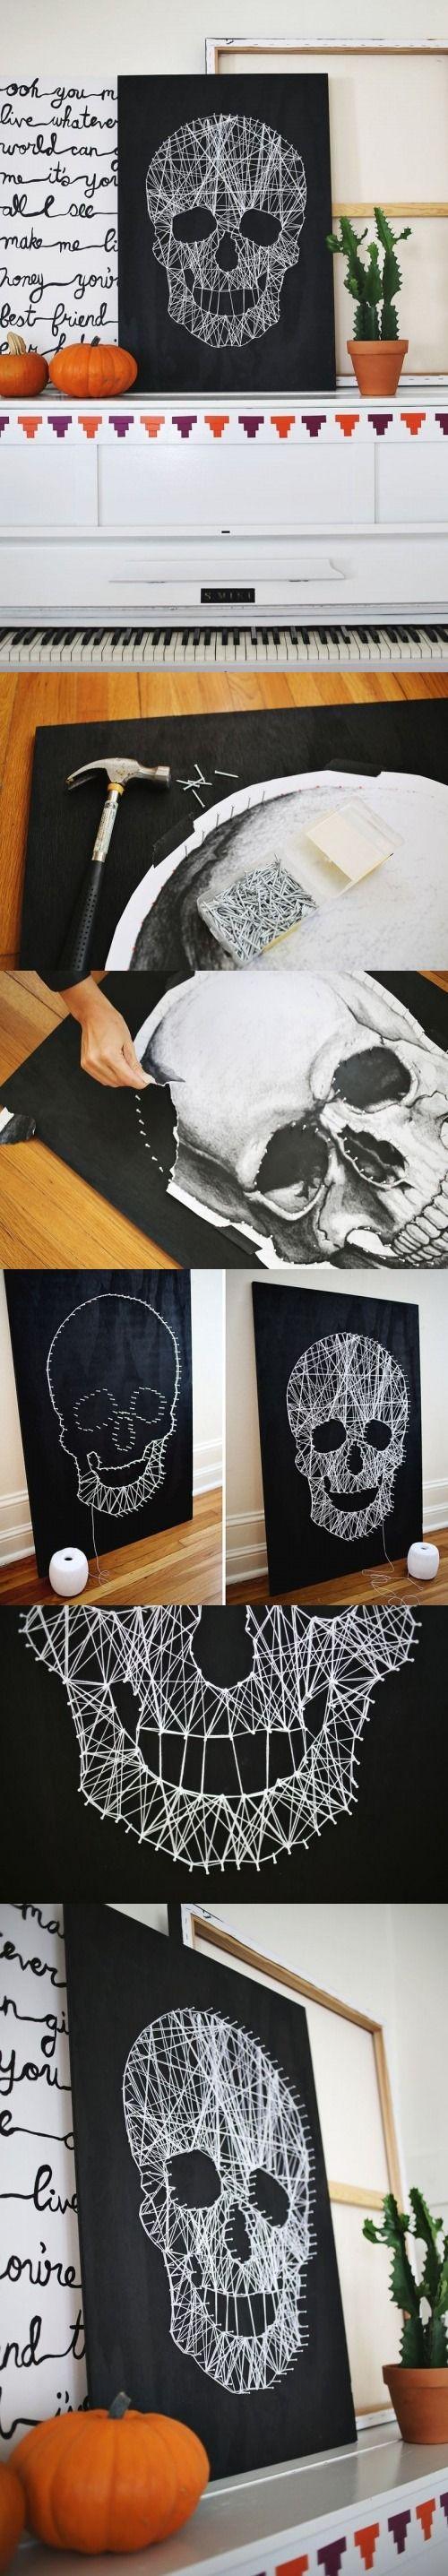 15 diy halloween skull decoration ideas - Youtube Halloween Crafts